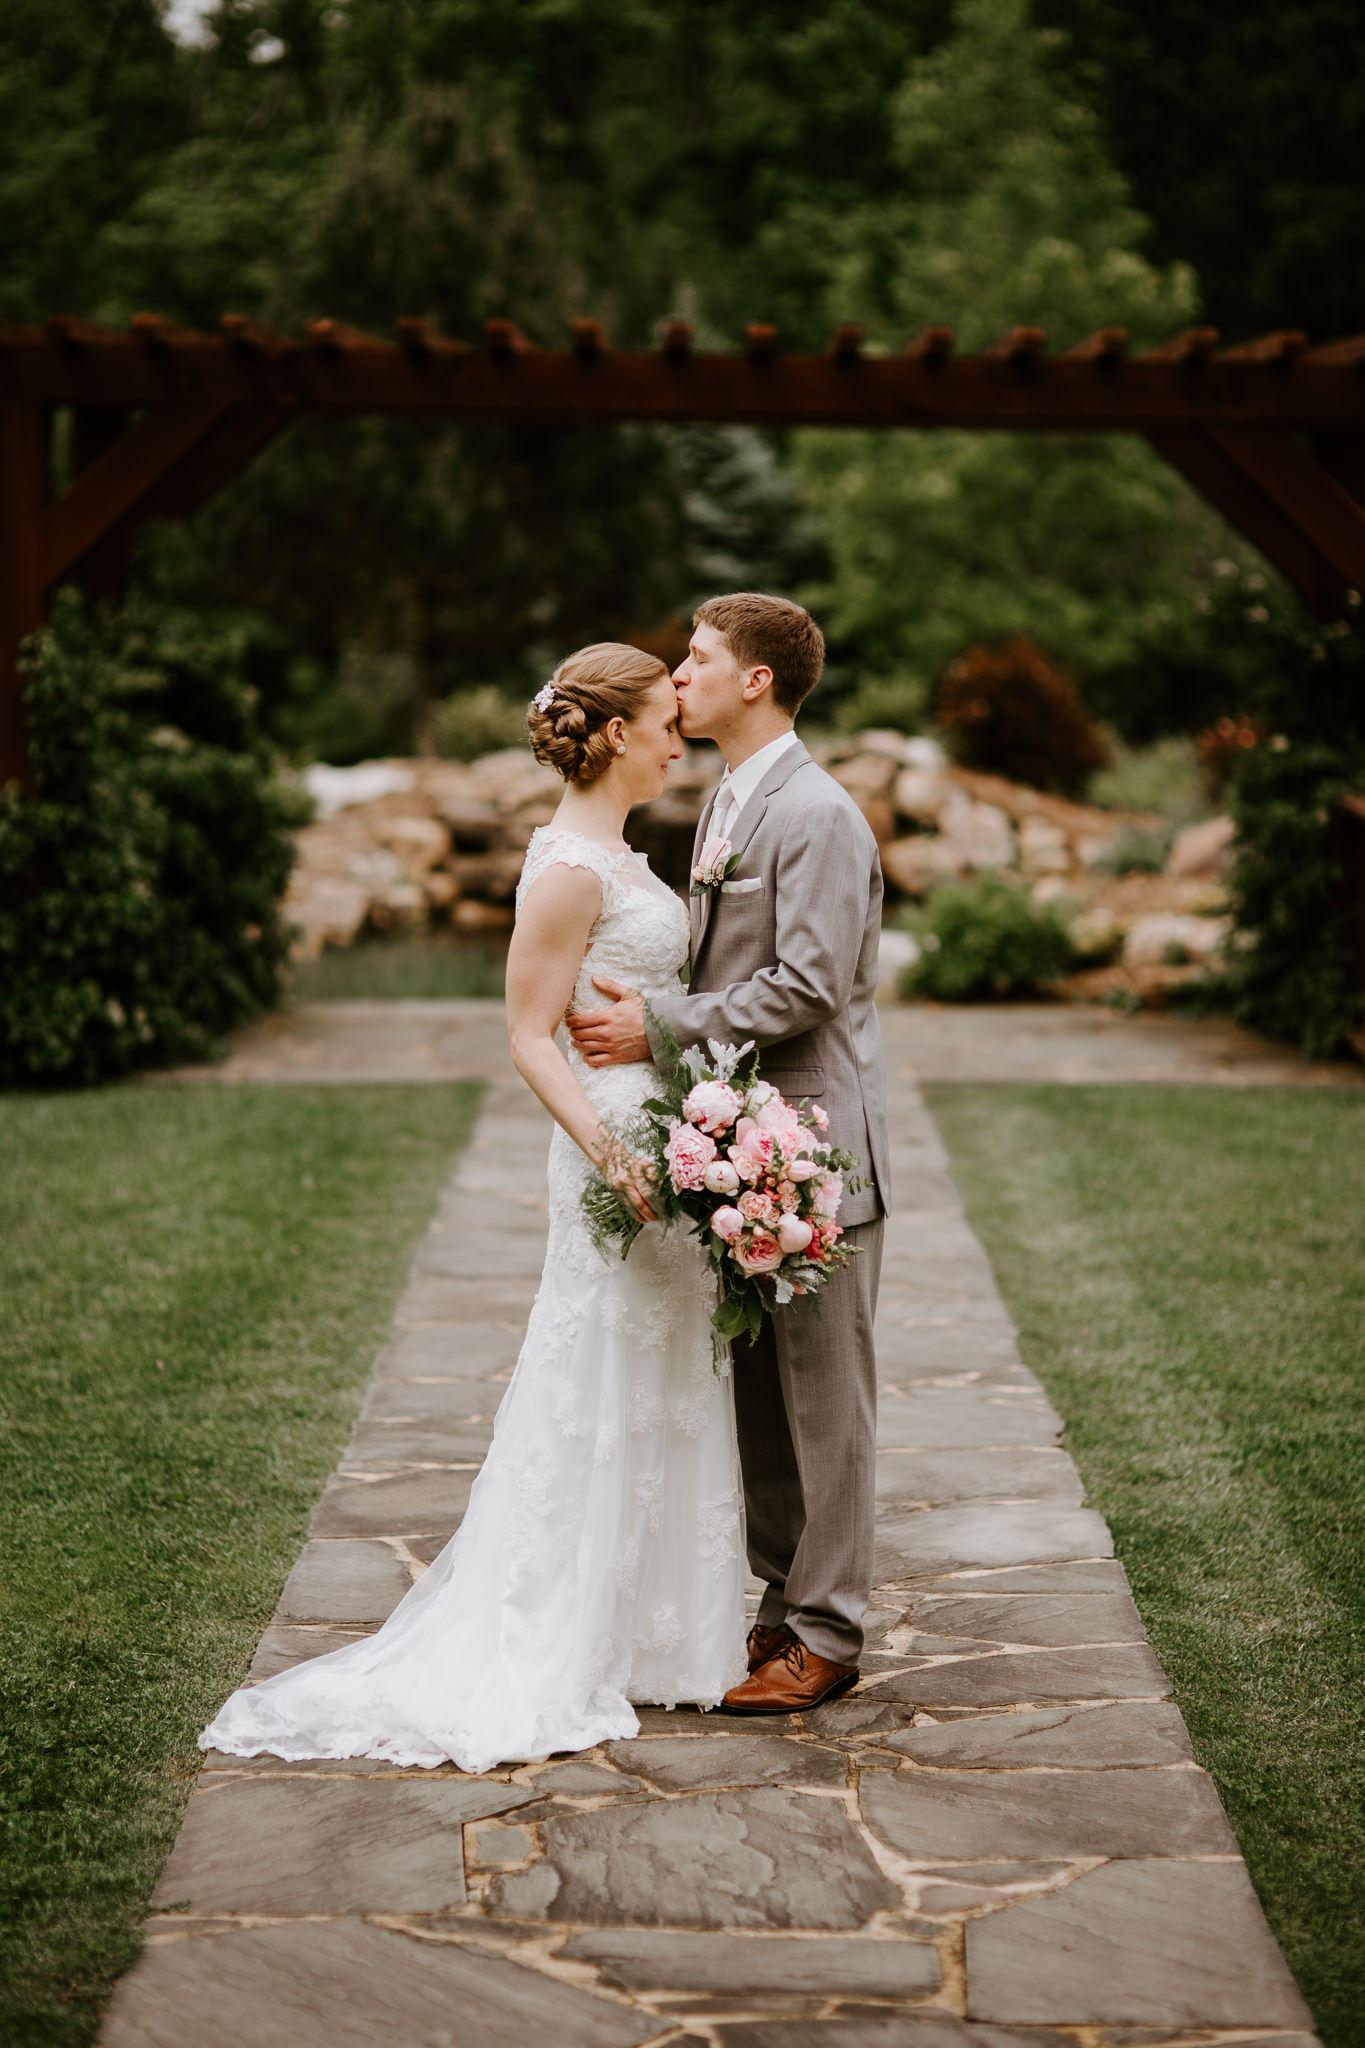 House Mountain Inn - Weddings - Lexington - Virginia - Best Wedding Photographer - Pat Cori Photography-31.jpg